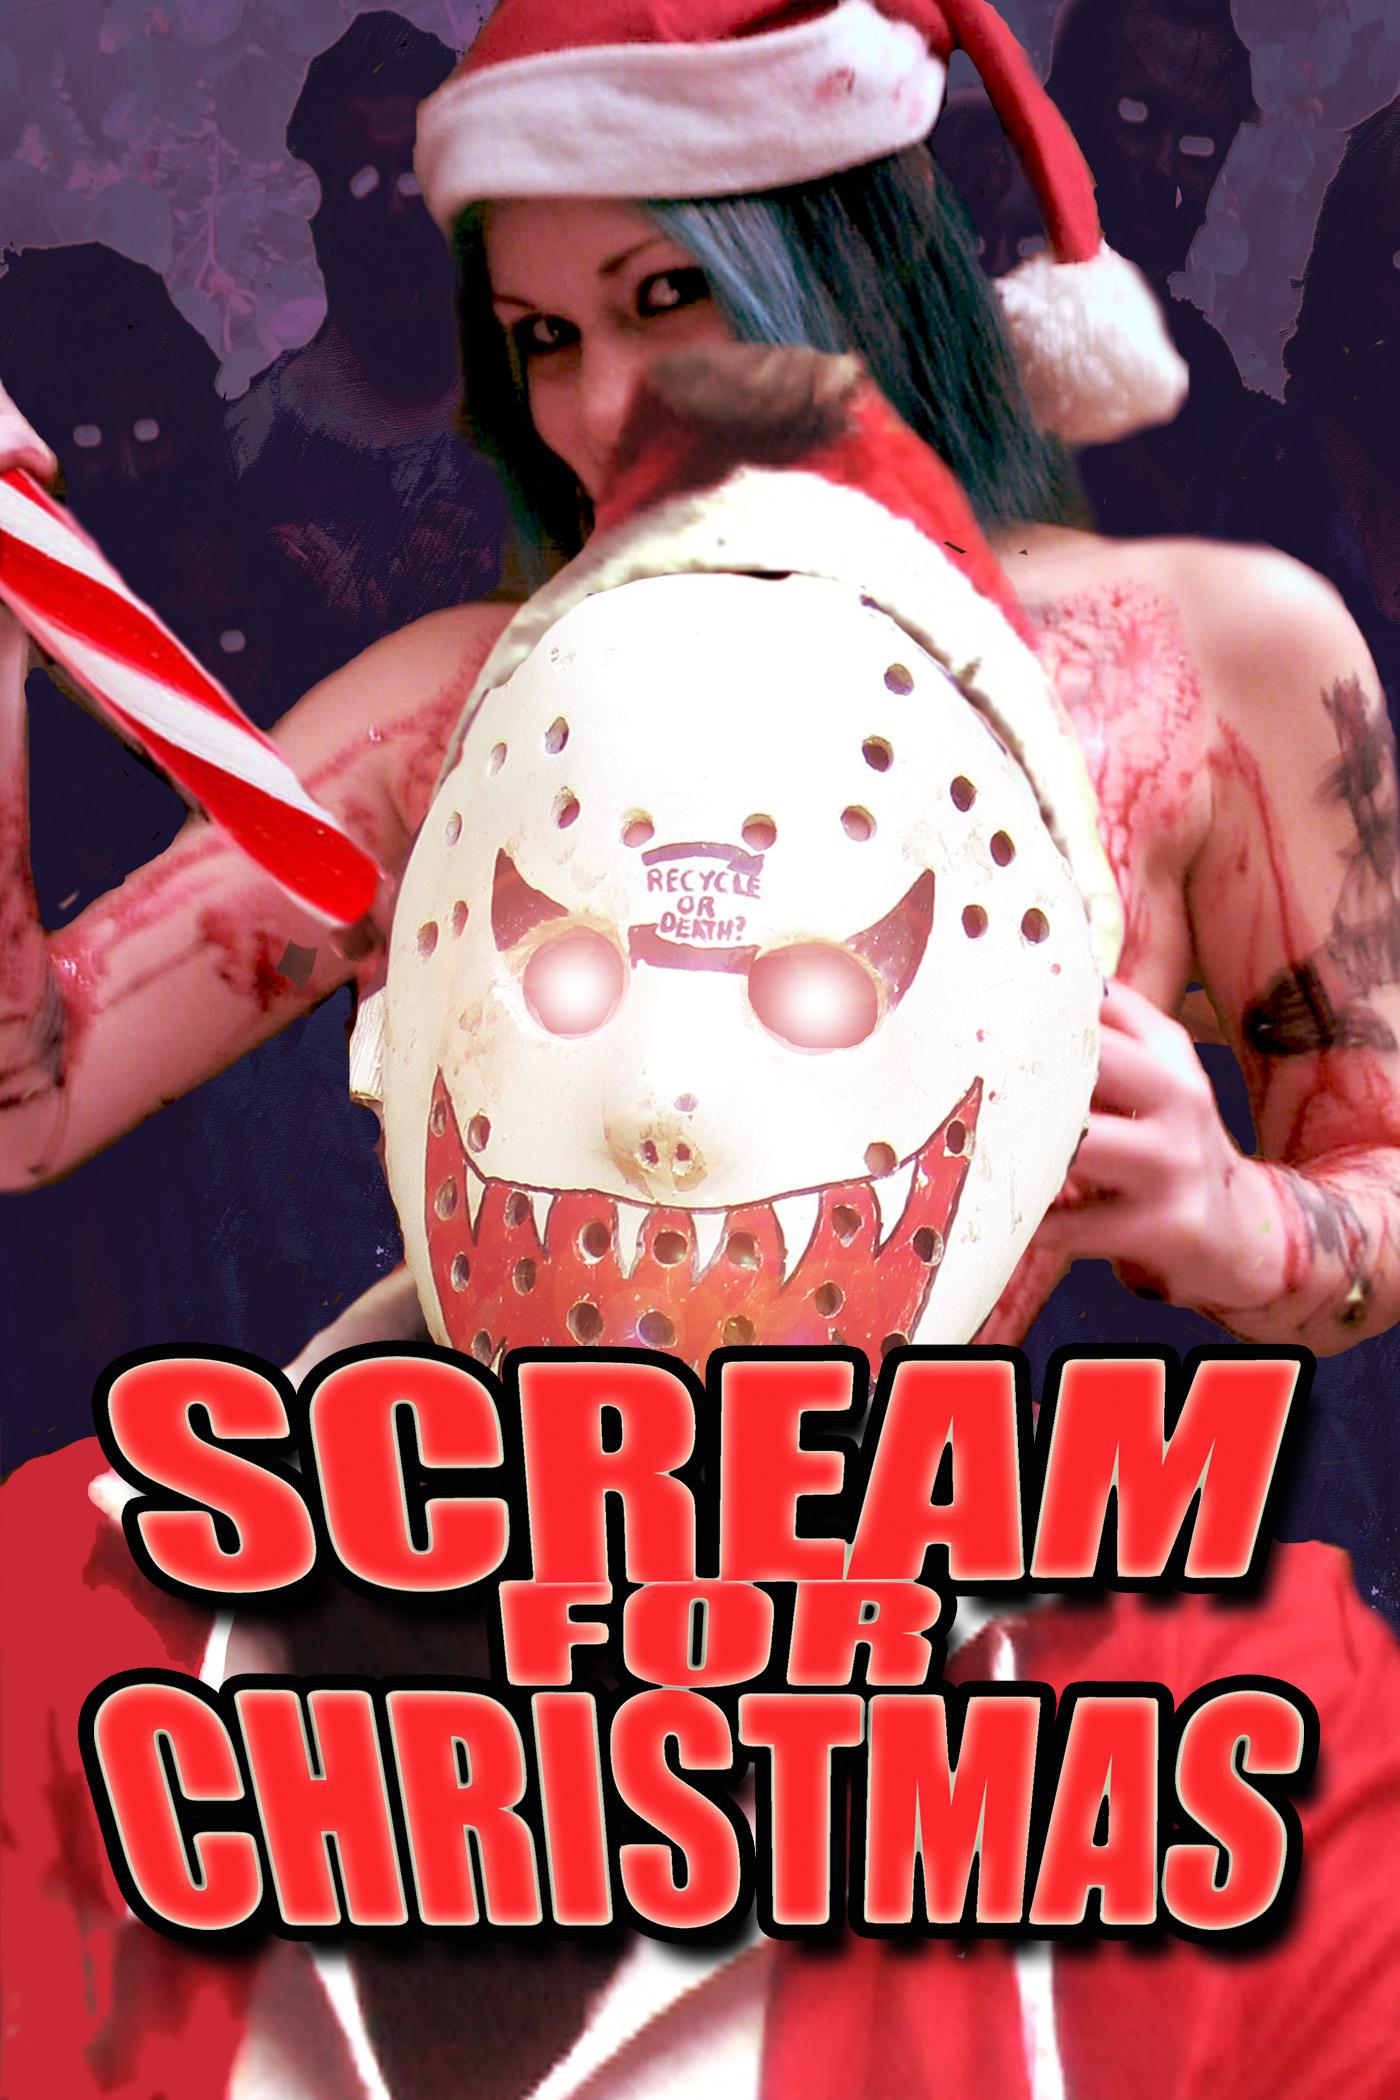 Scream for Christmas (2000) - IMDb